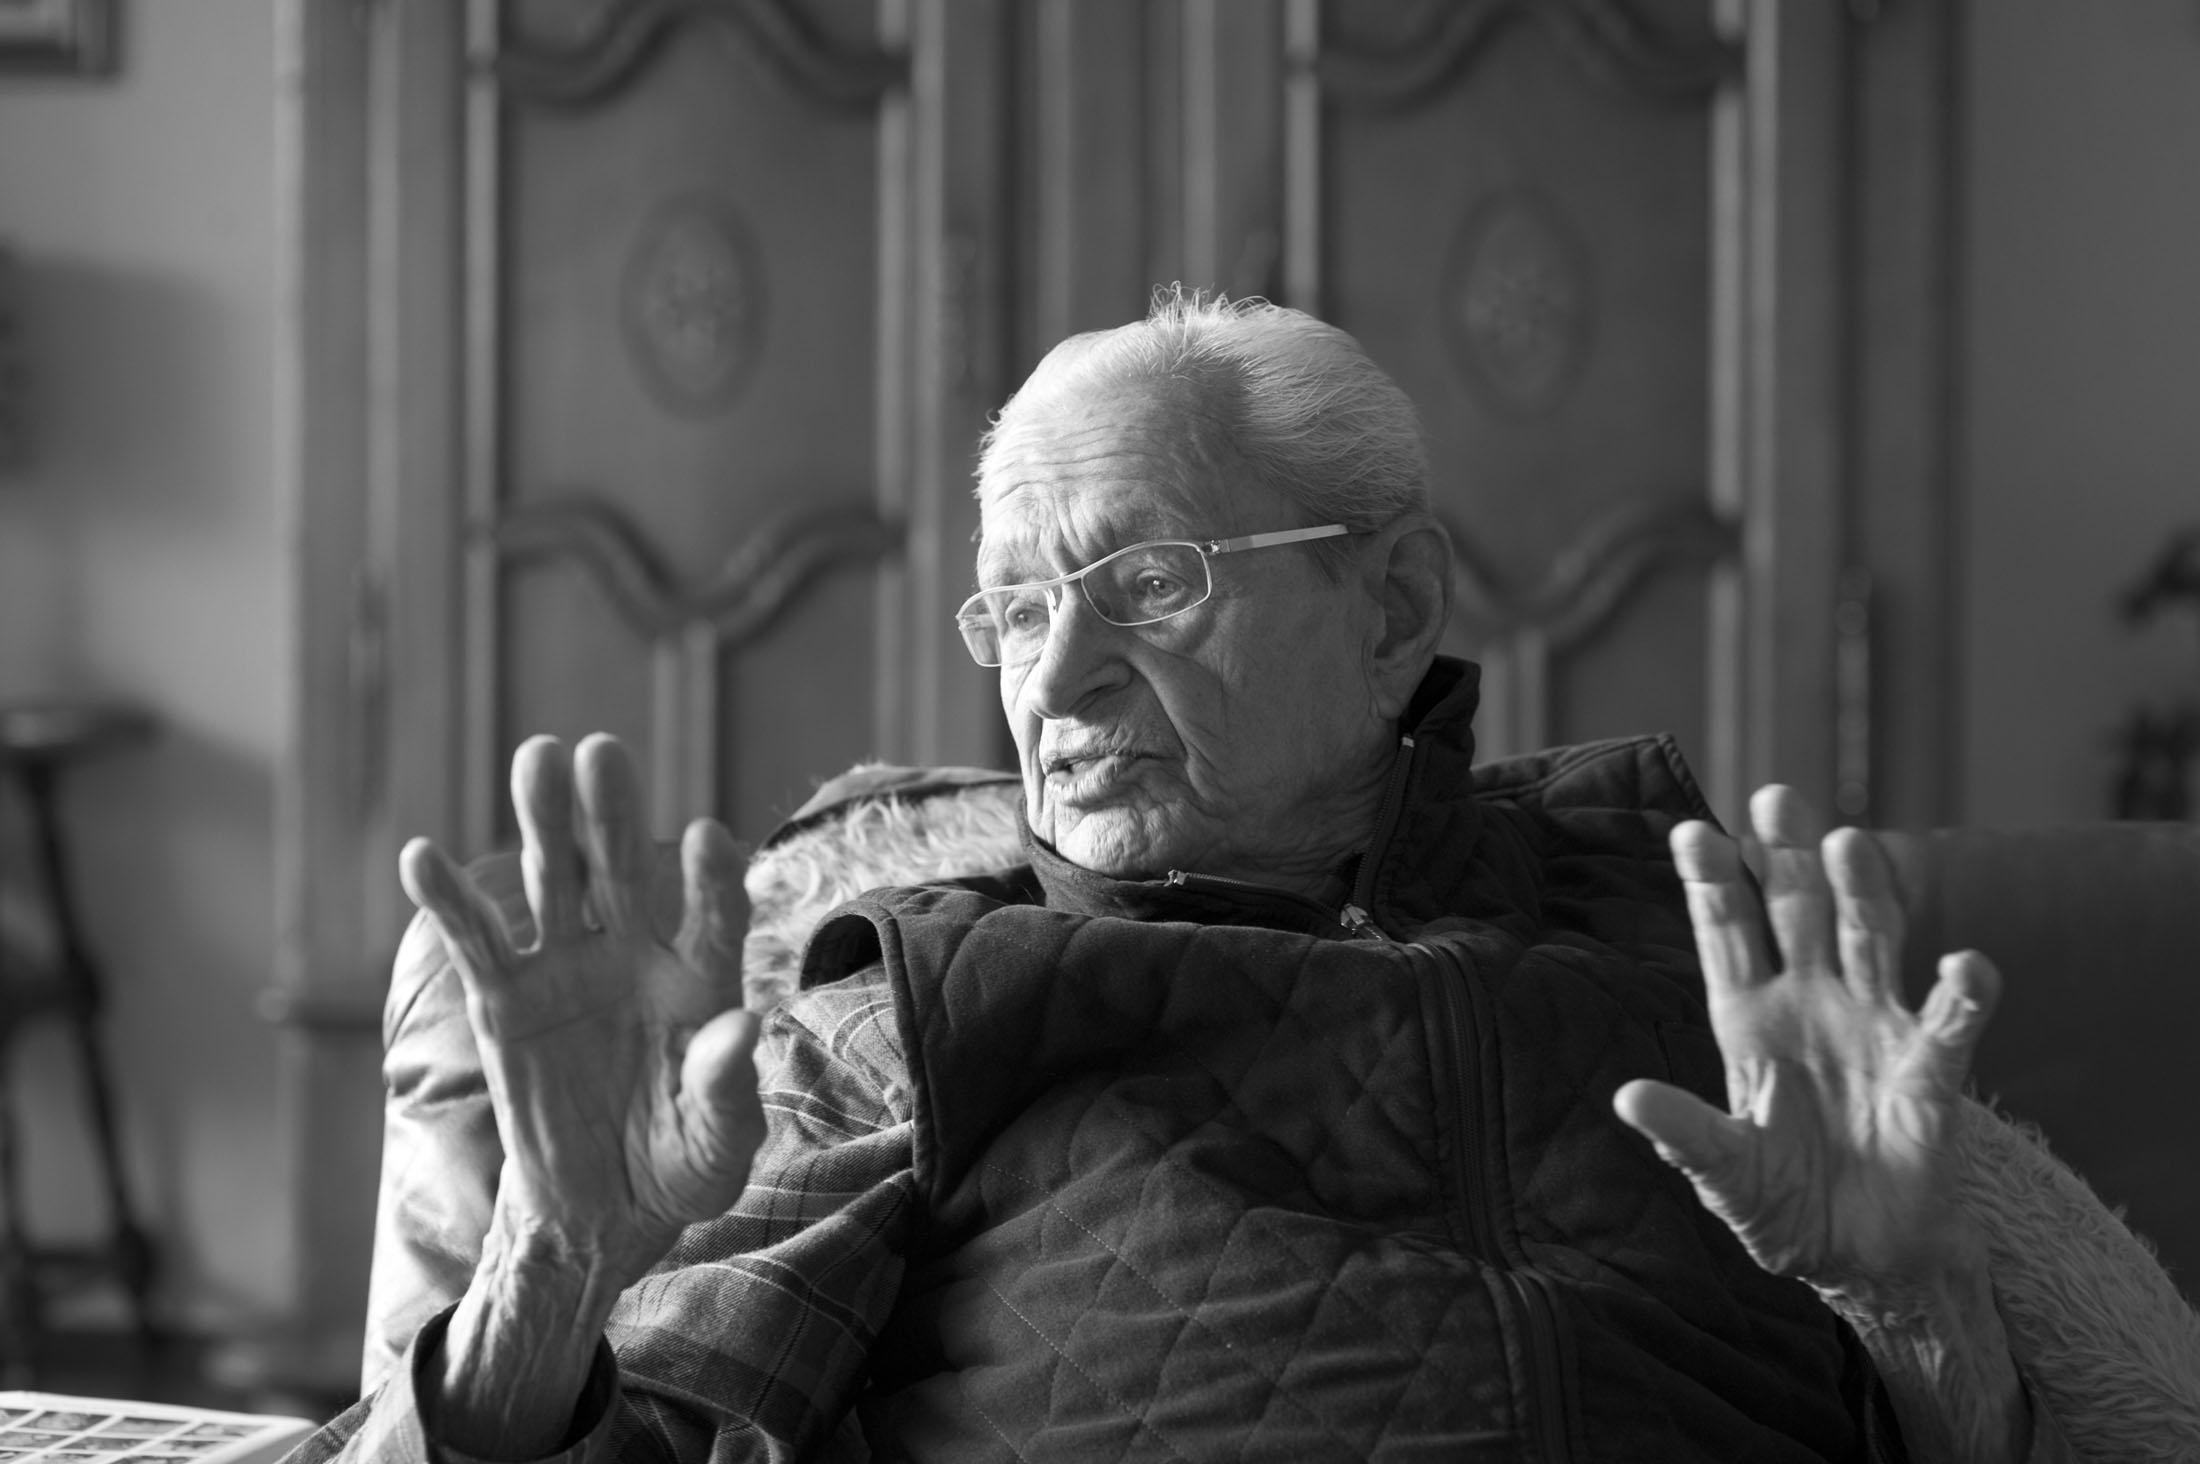 Gerhard Hindenlang